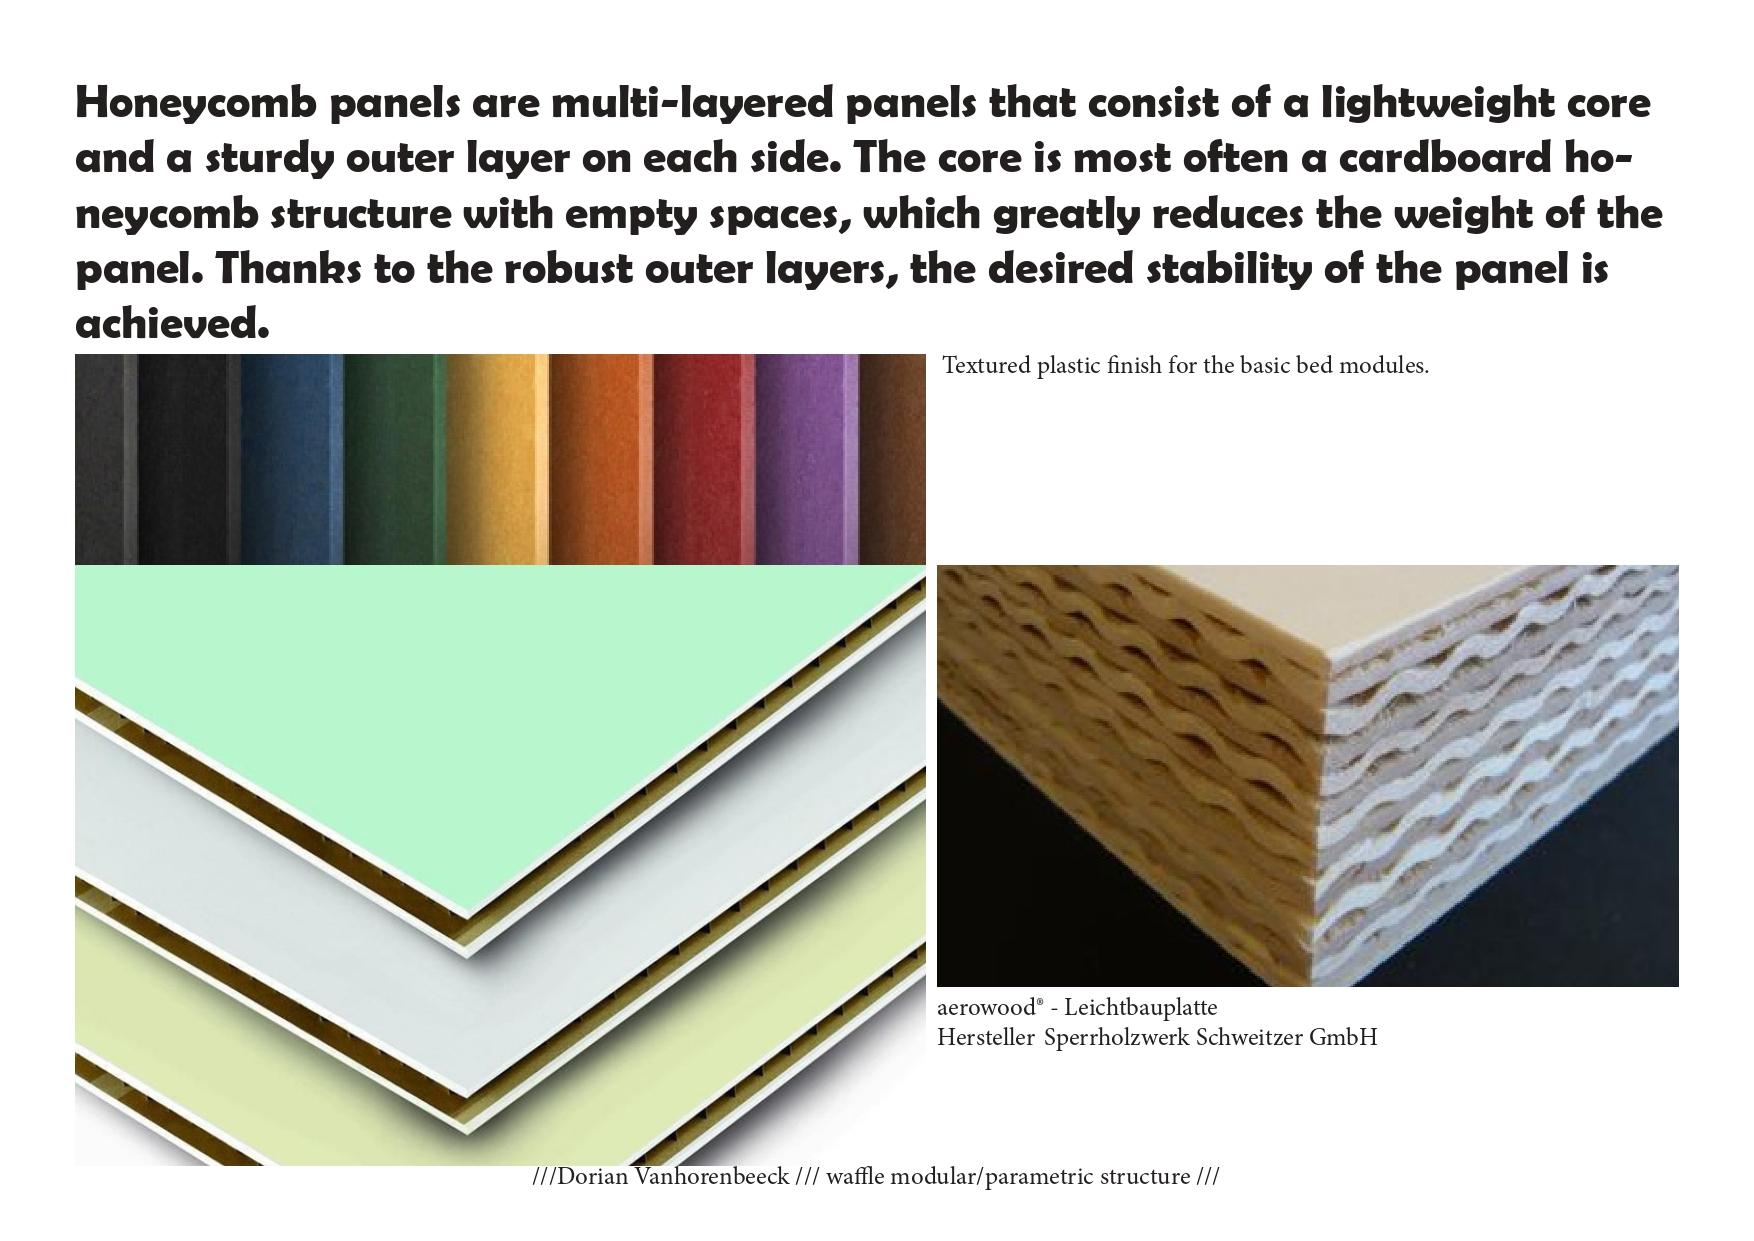 Livret Waffle modular-parametric Structure Dorian Vanhorenbeeck_page-0010